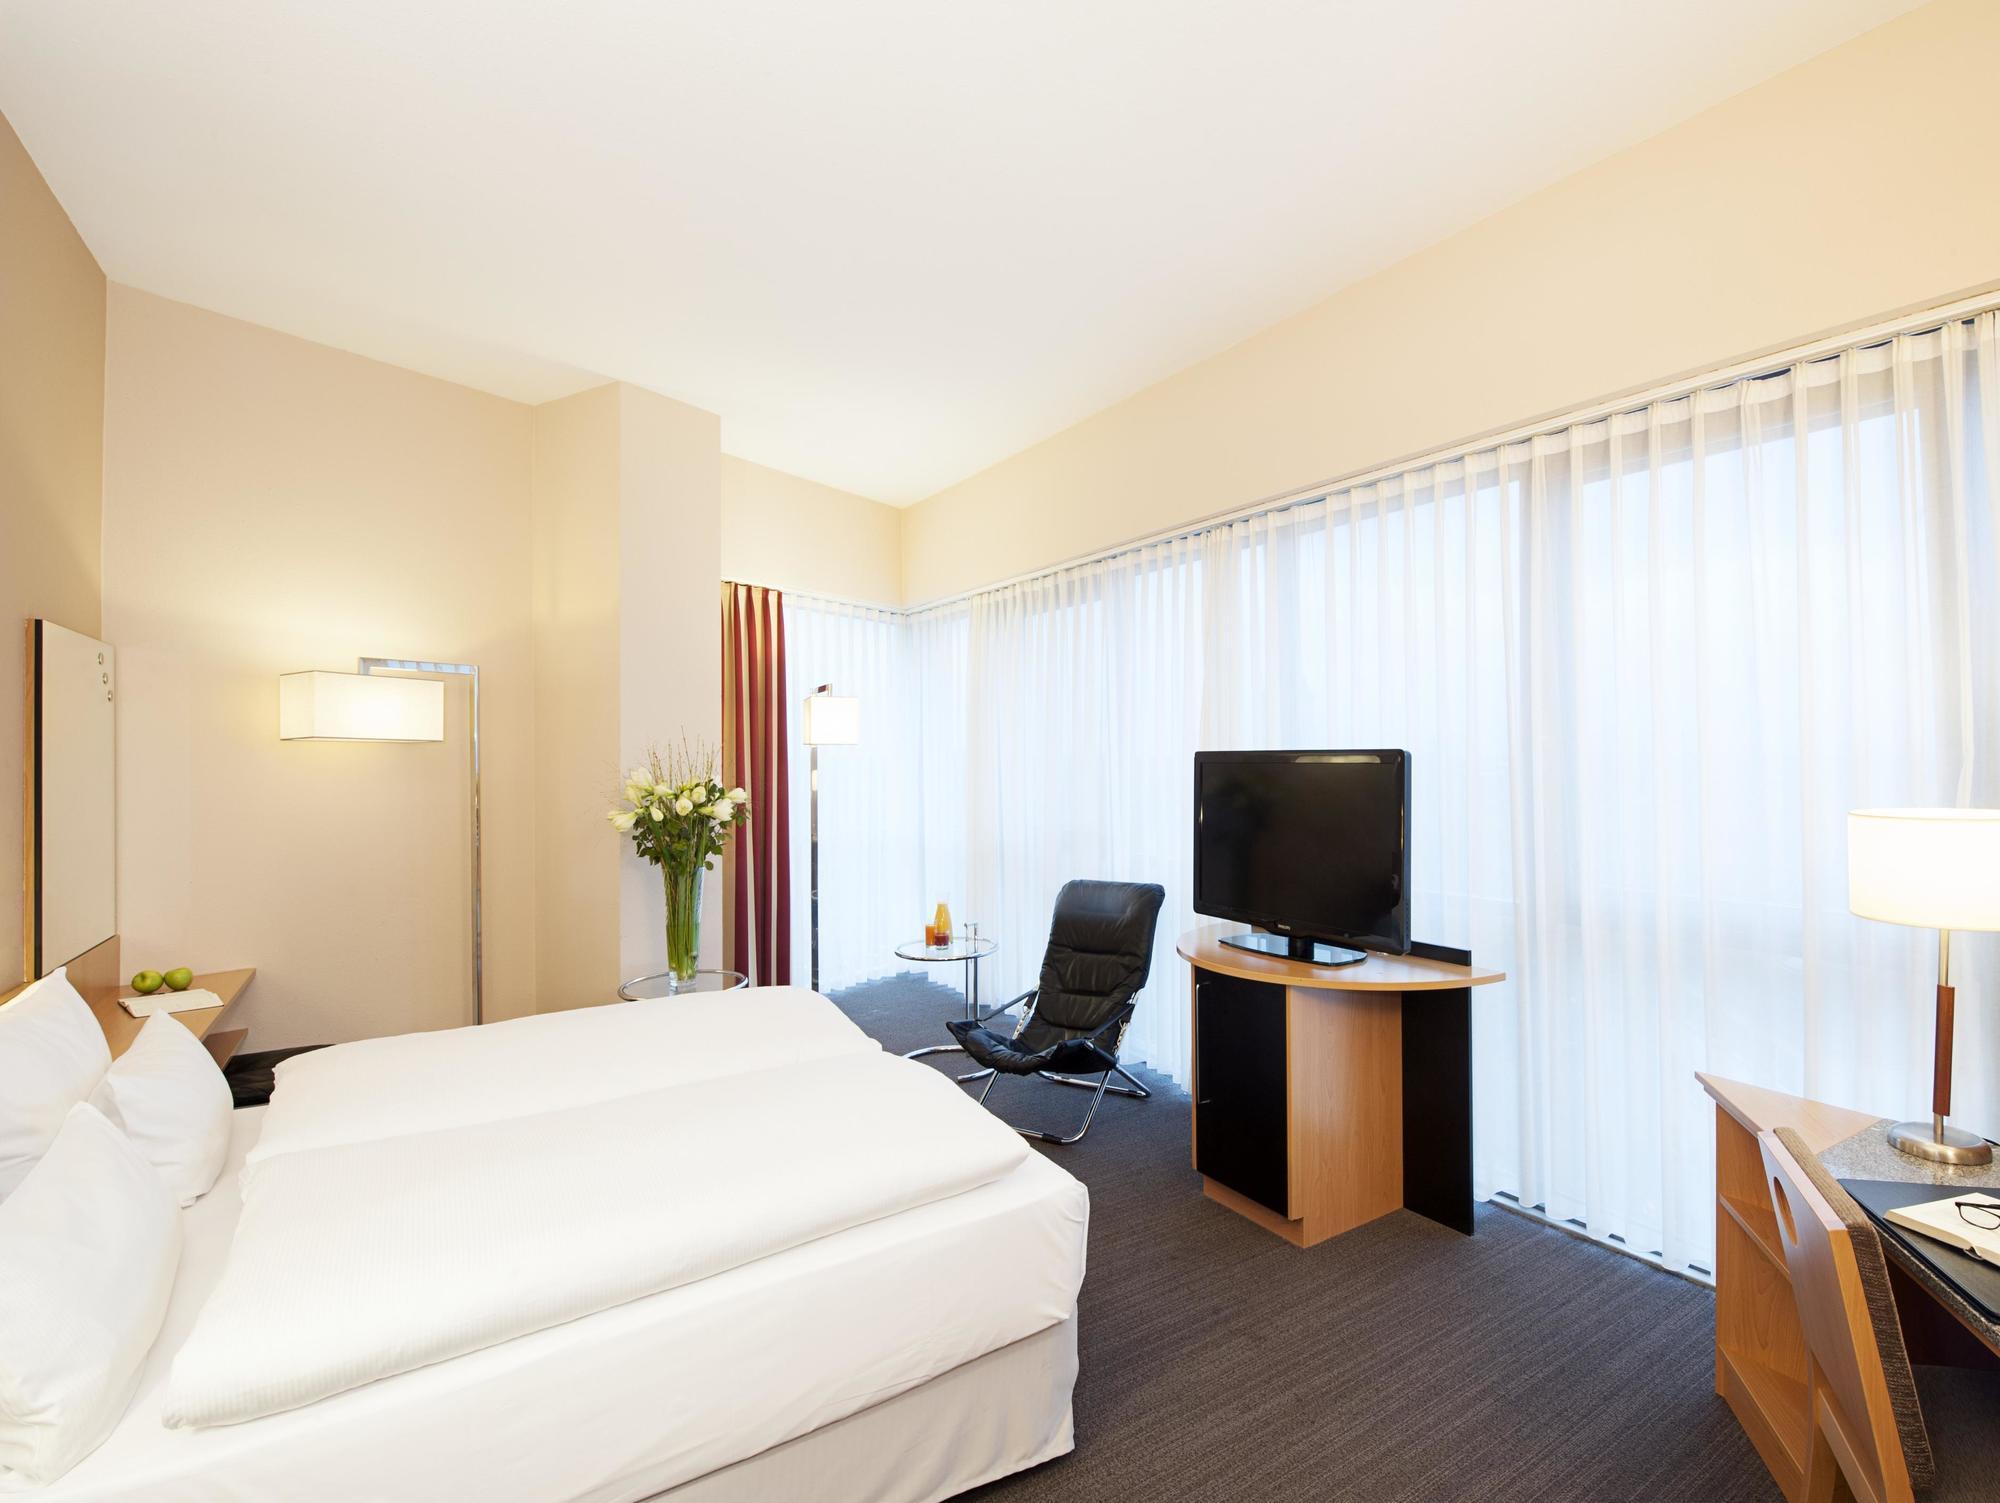 Hotel nh duesseldorf city, dÜsseldorf ****